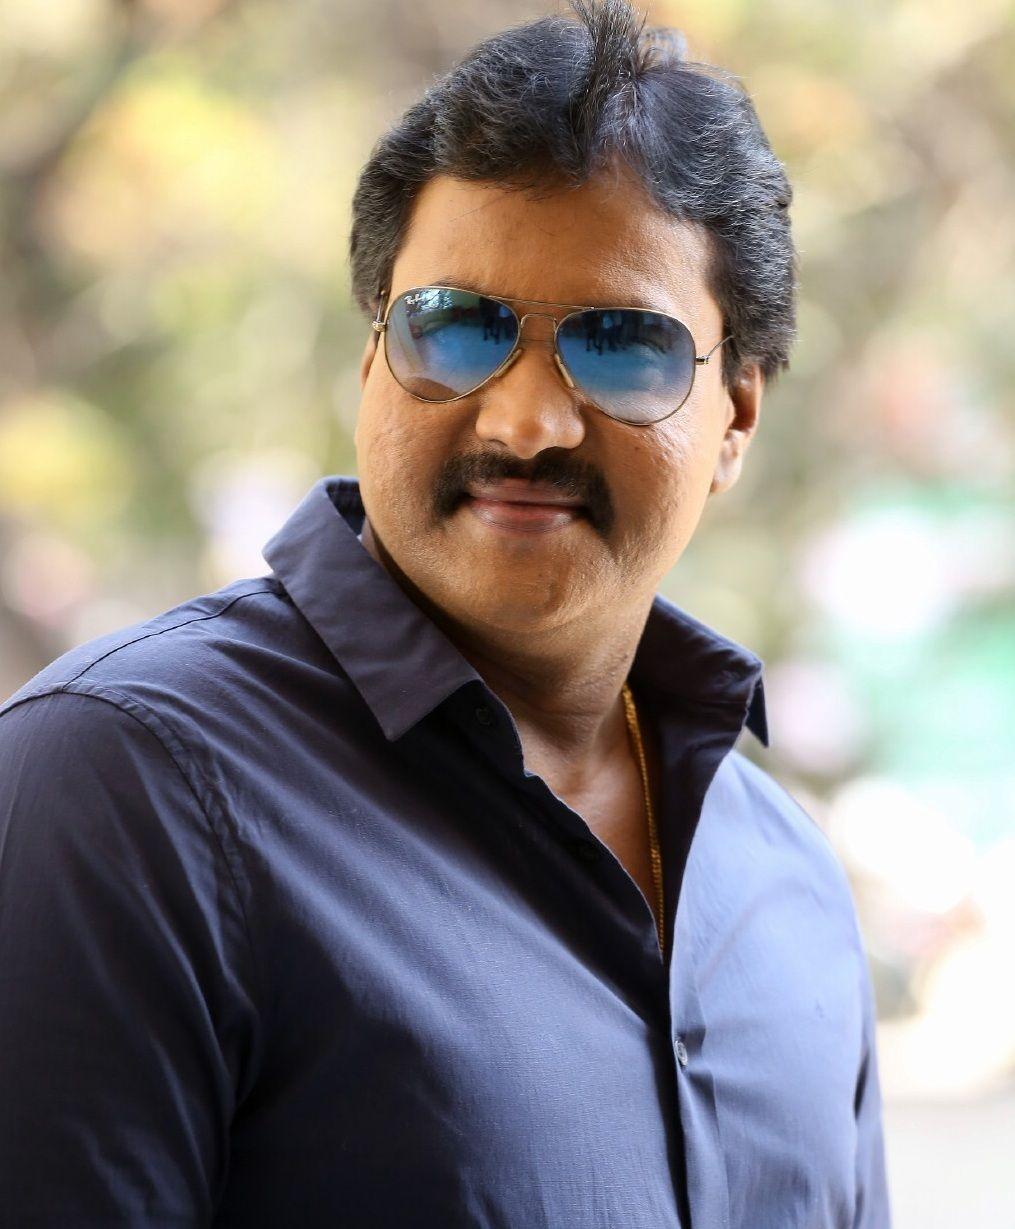 Sunil Telugu Actor Wiki Age Wikipedia Wife Birthday Movies Biography Indian Celebrities Actors Movie List